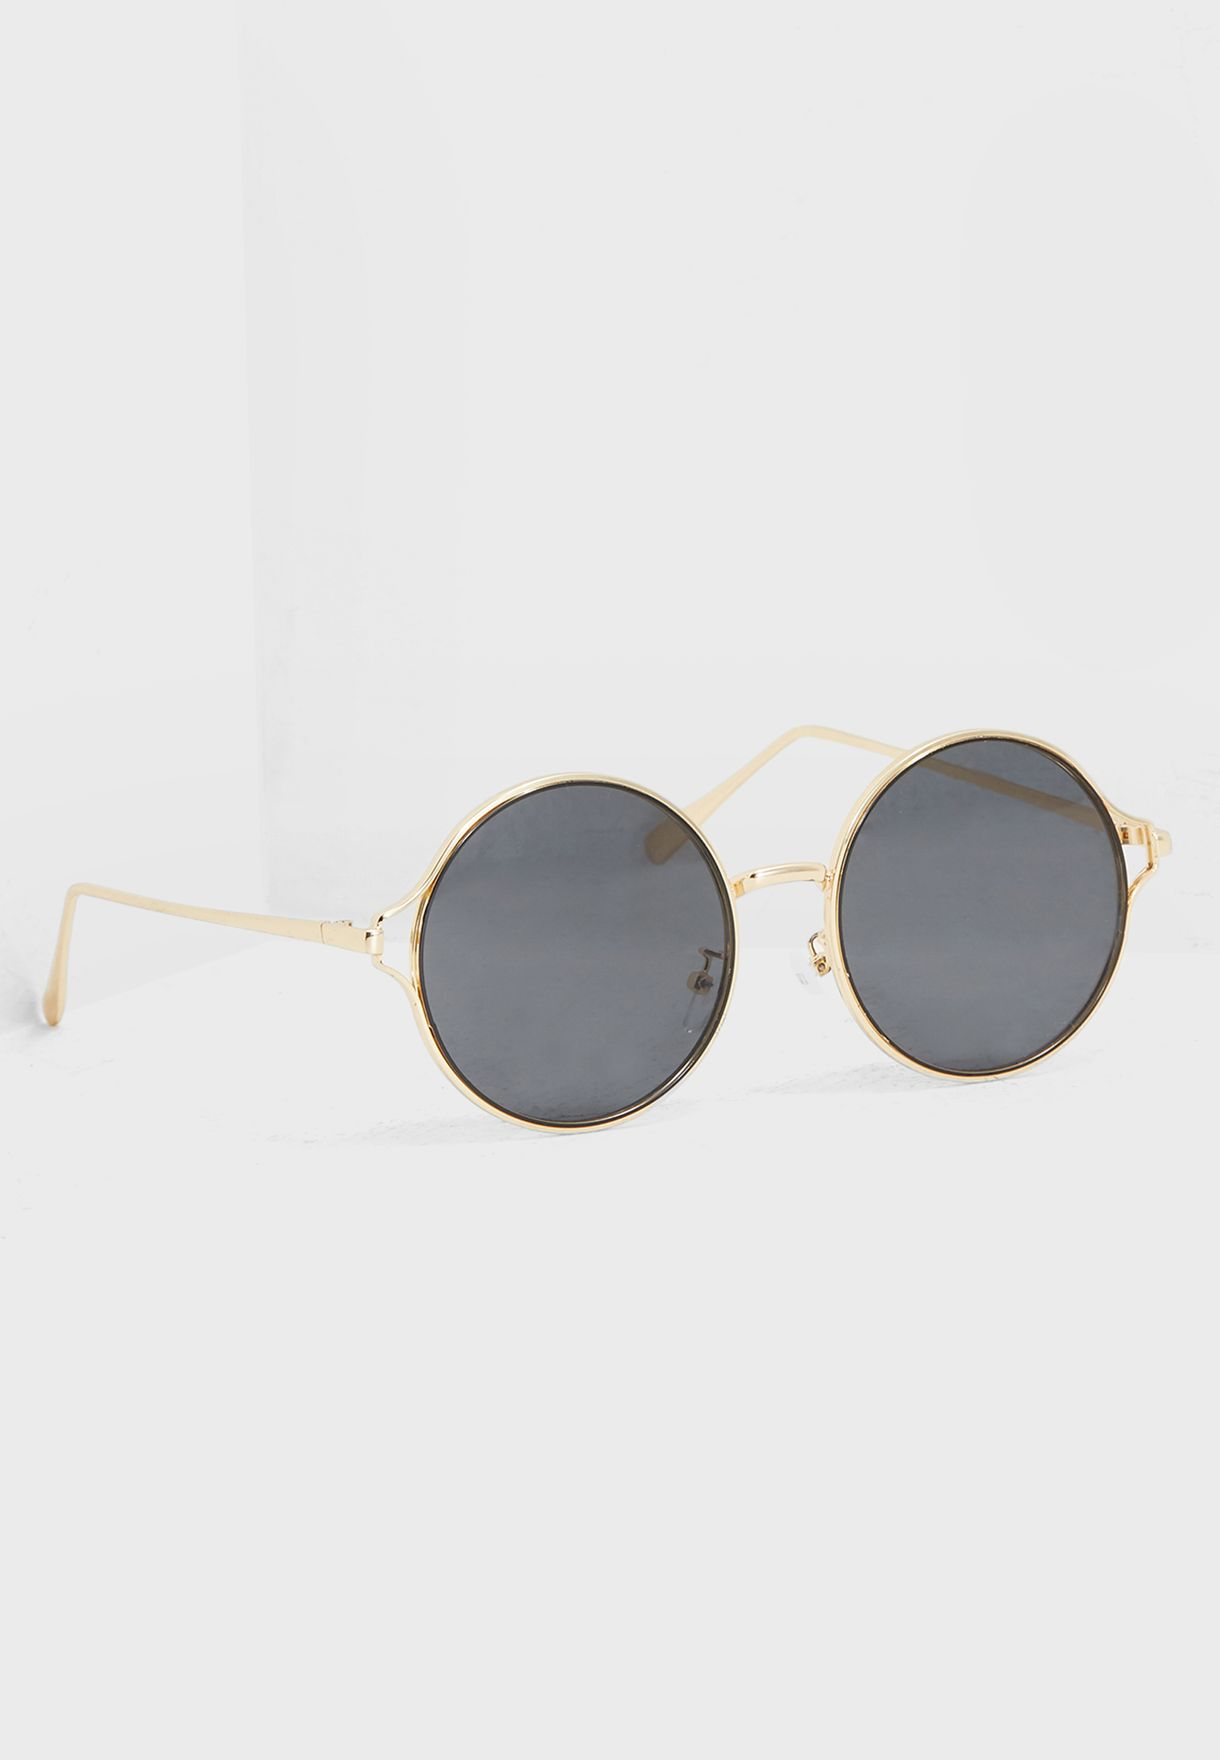 5f10d5f36c3 Shop Ginger gold Round Sunglasses 3013 for Women in Qatar - GI121AC76MZN